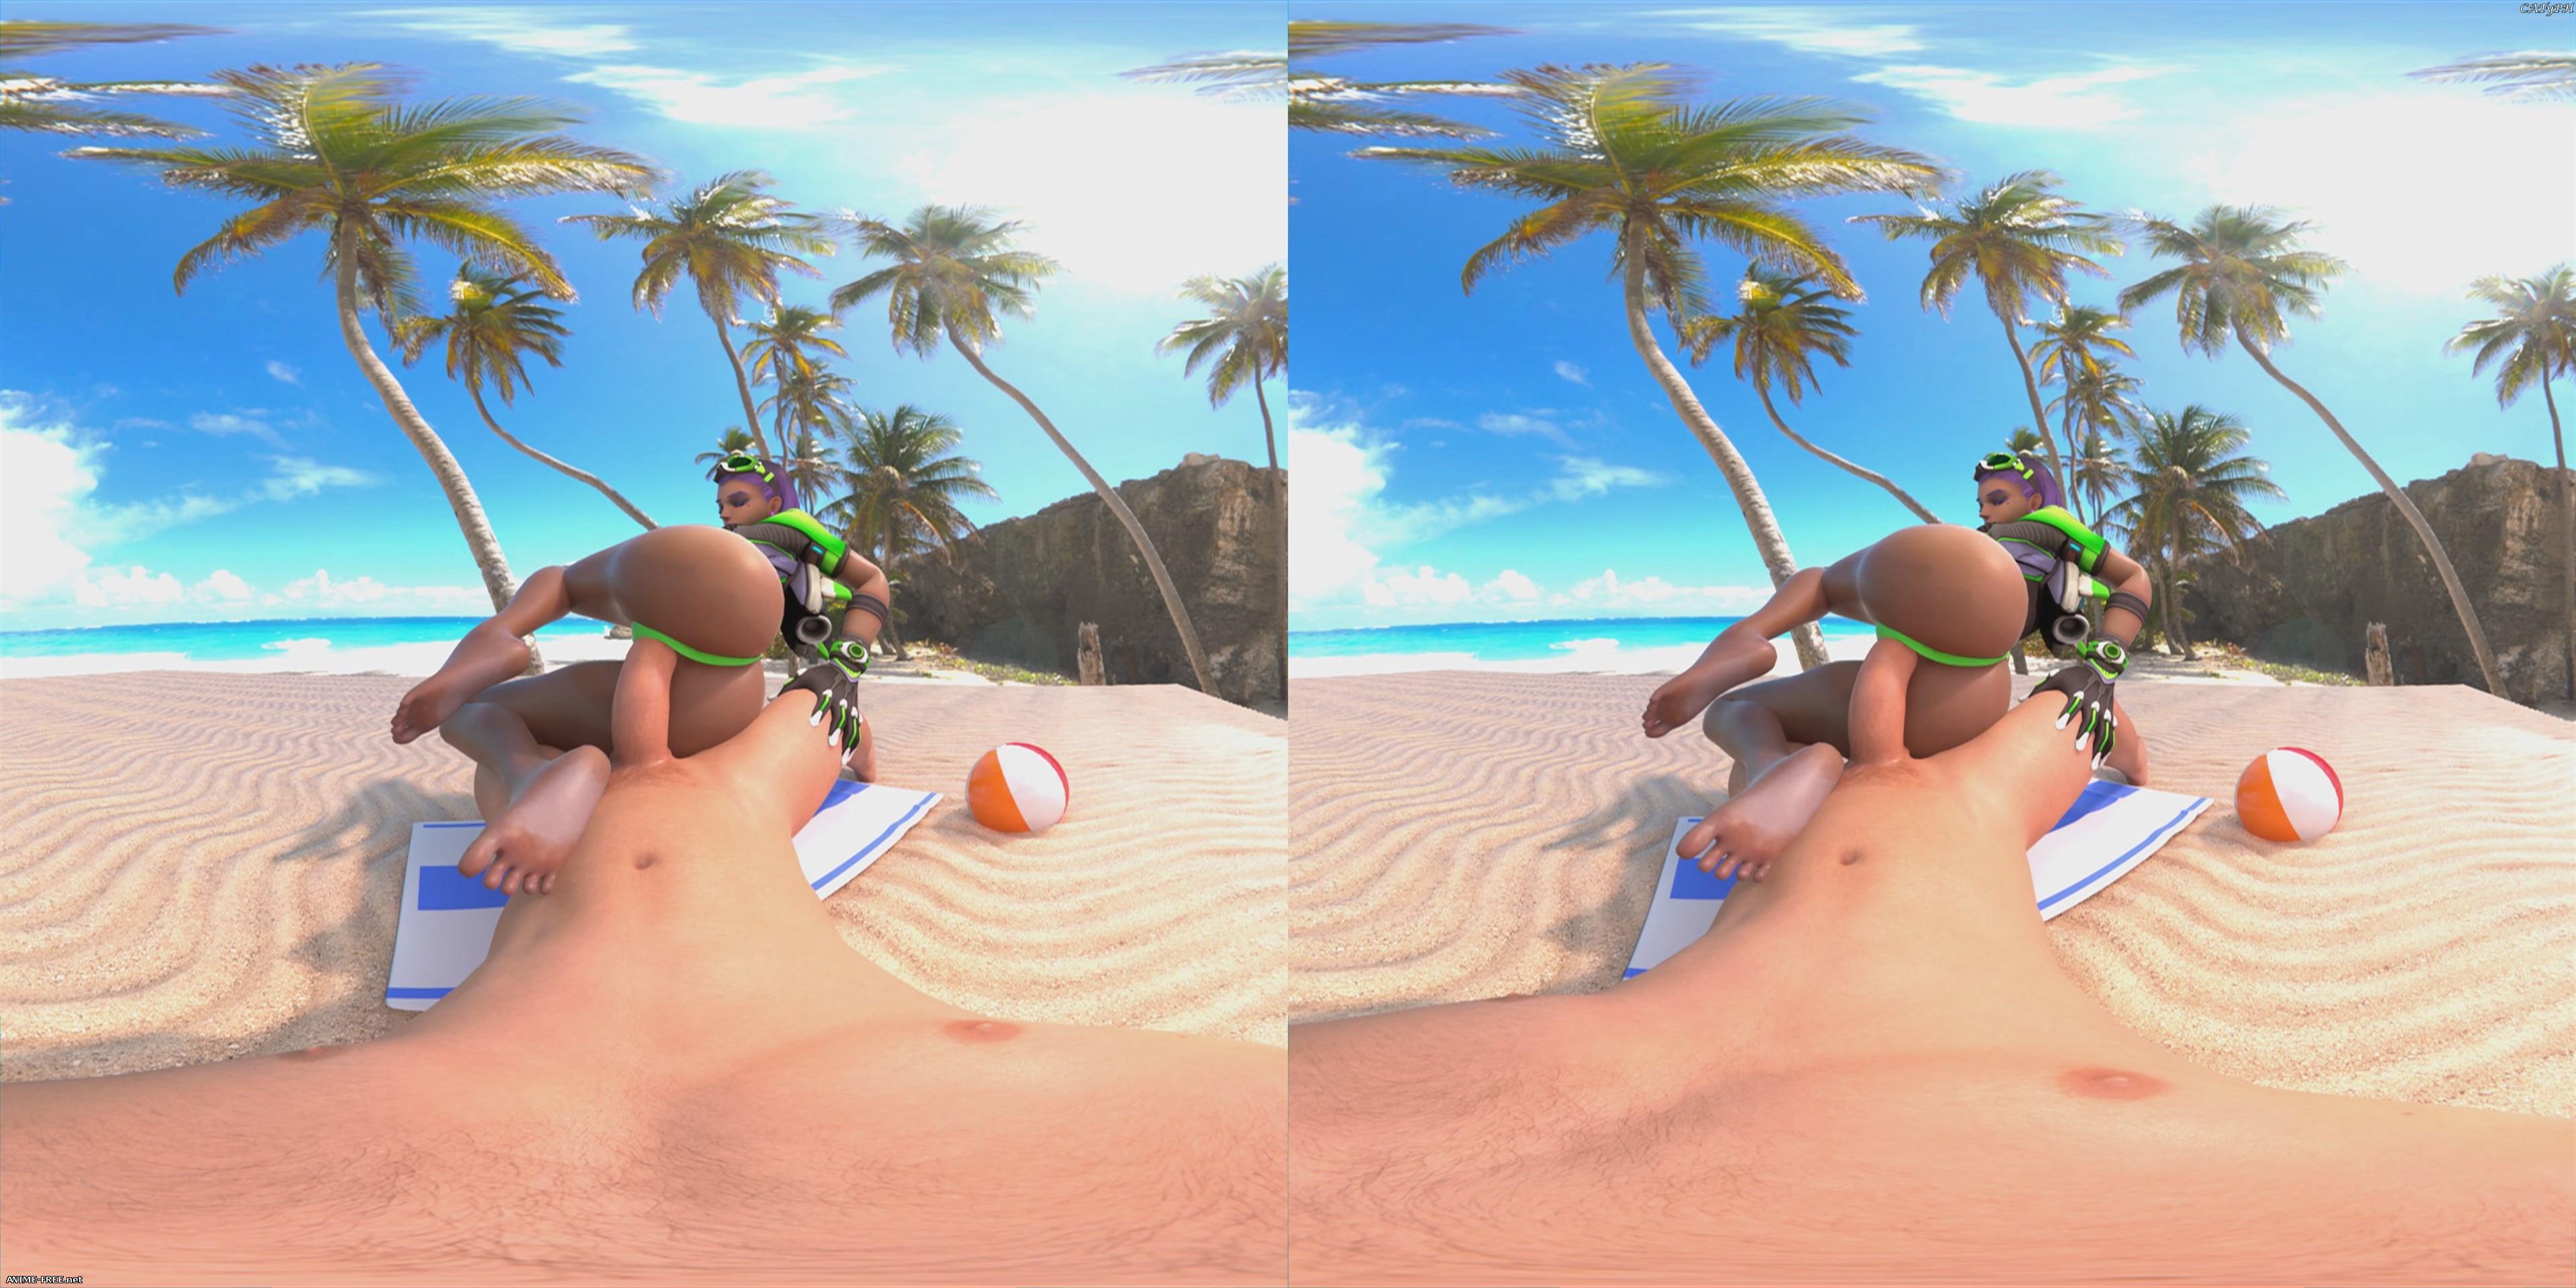 Hentai VR - Overwatch Pack [2019] [Uncen] [UHD-4K] [ENG] 3D-Hentai